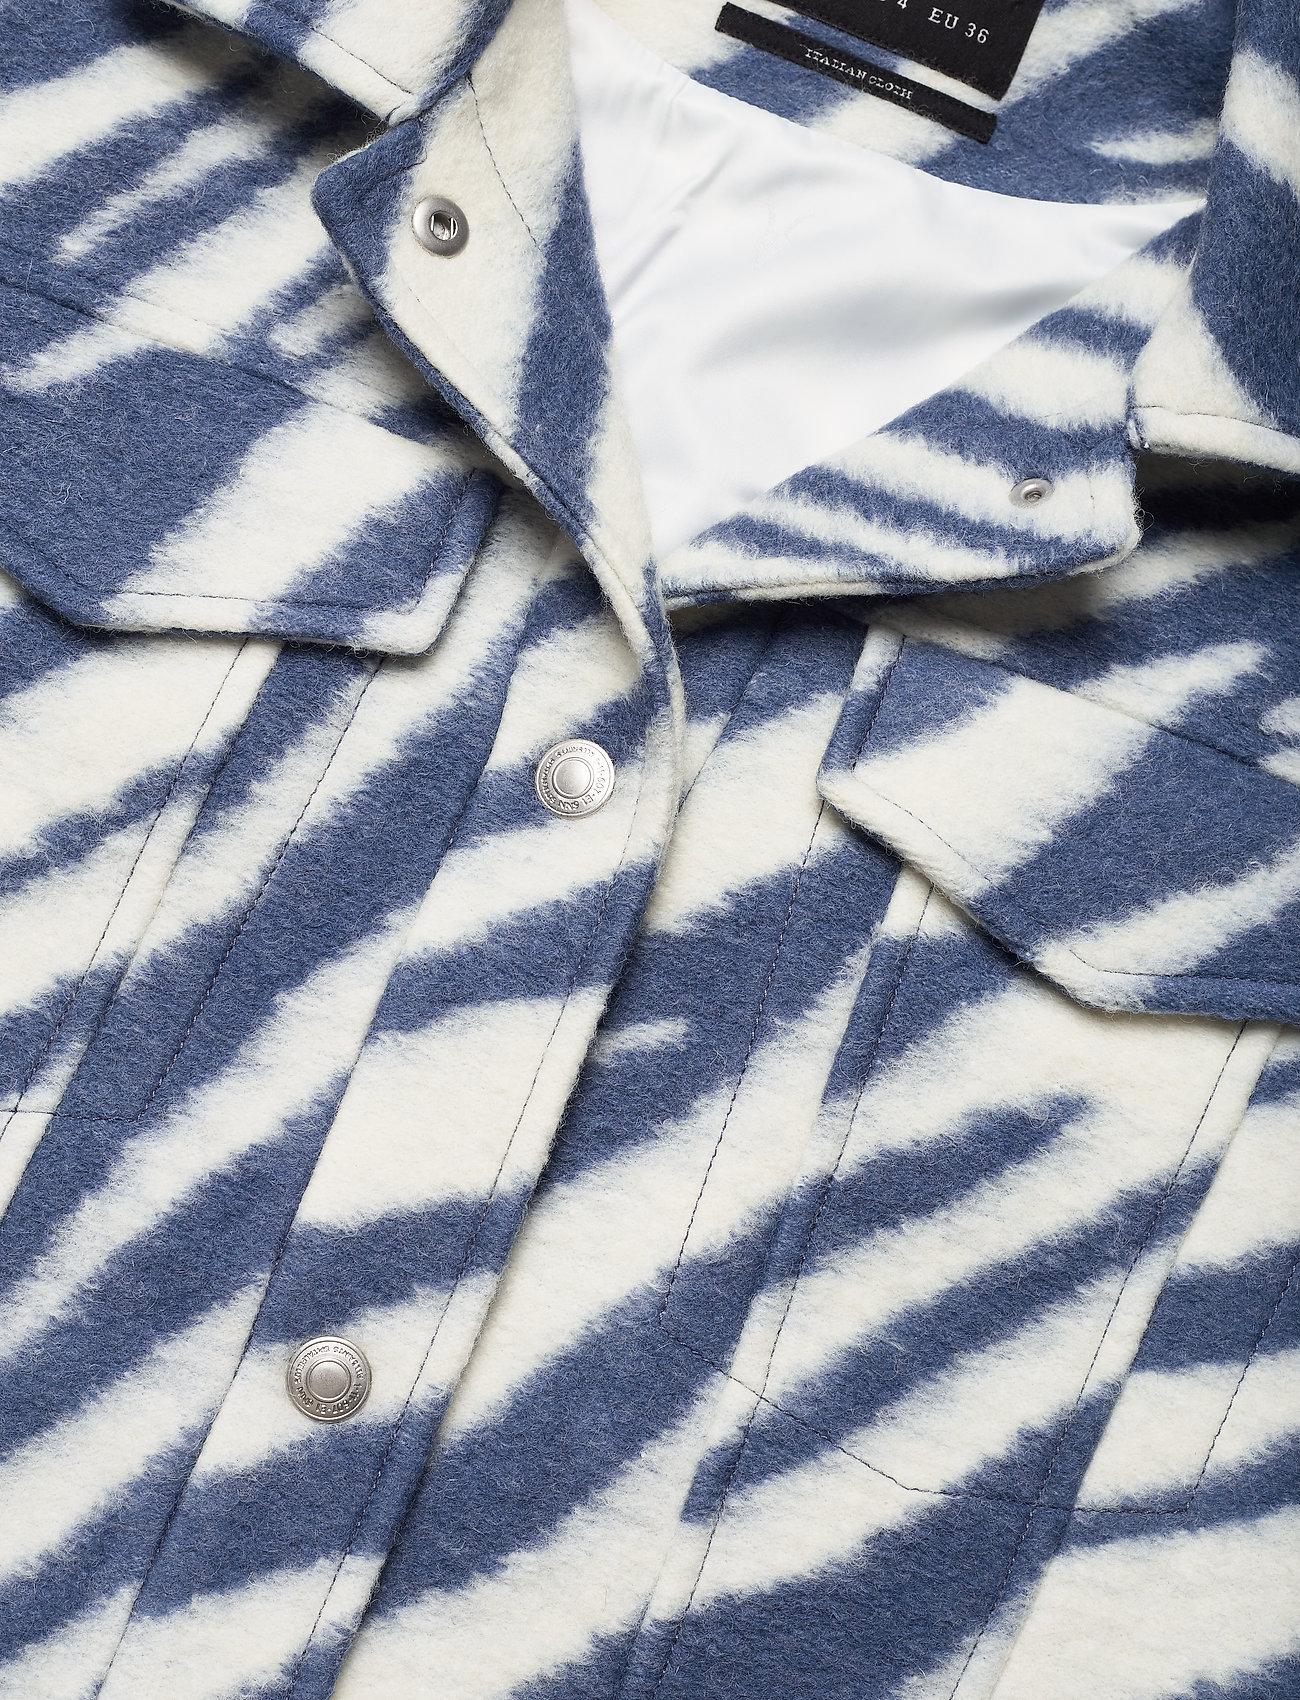 AllSaints - FAYE JACKET - wolljacken - blue/white - 2